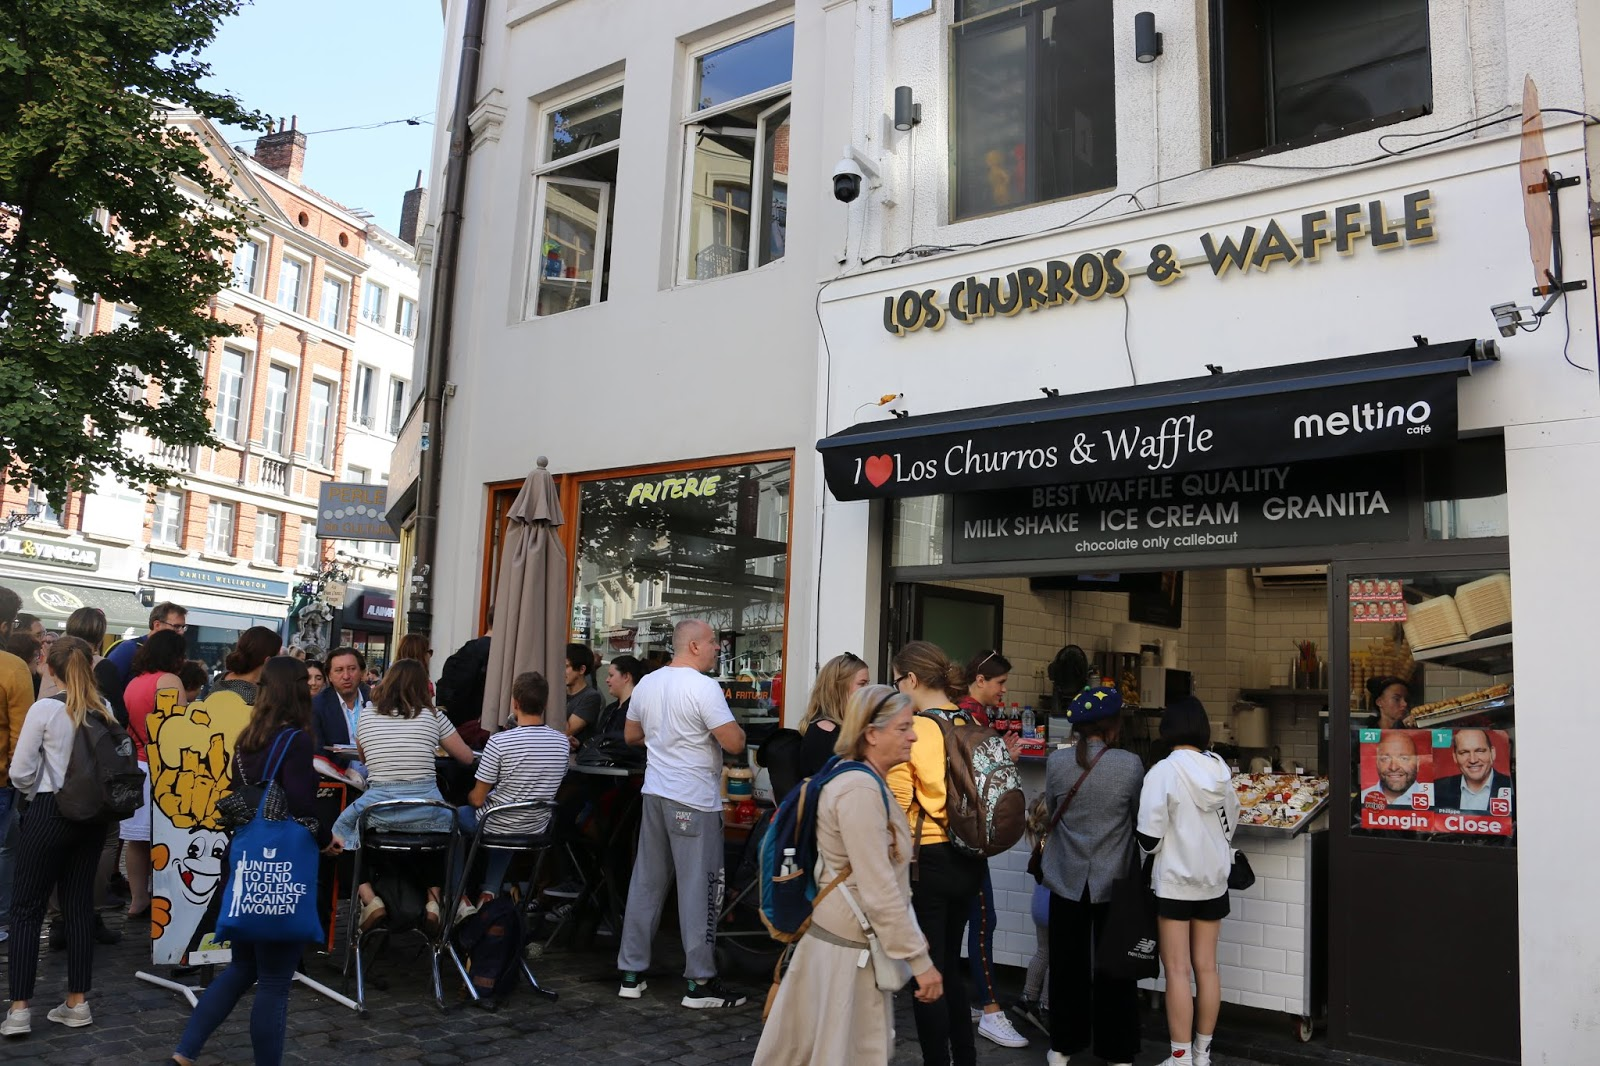 Los Churros & Waffle Brussels